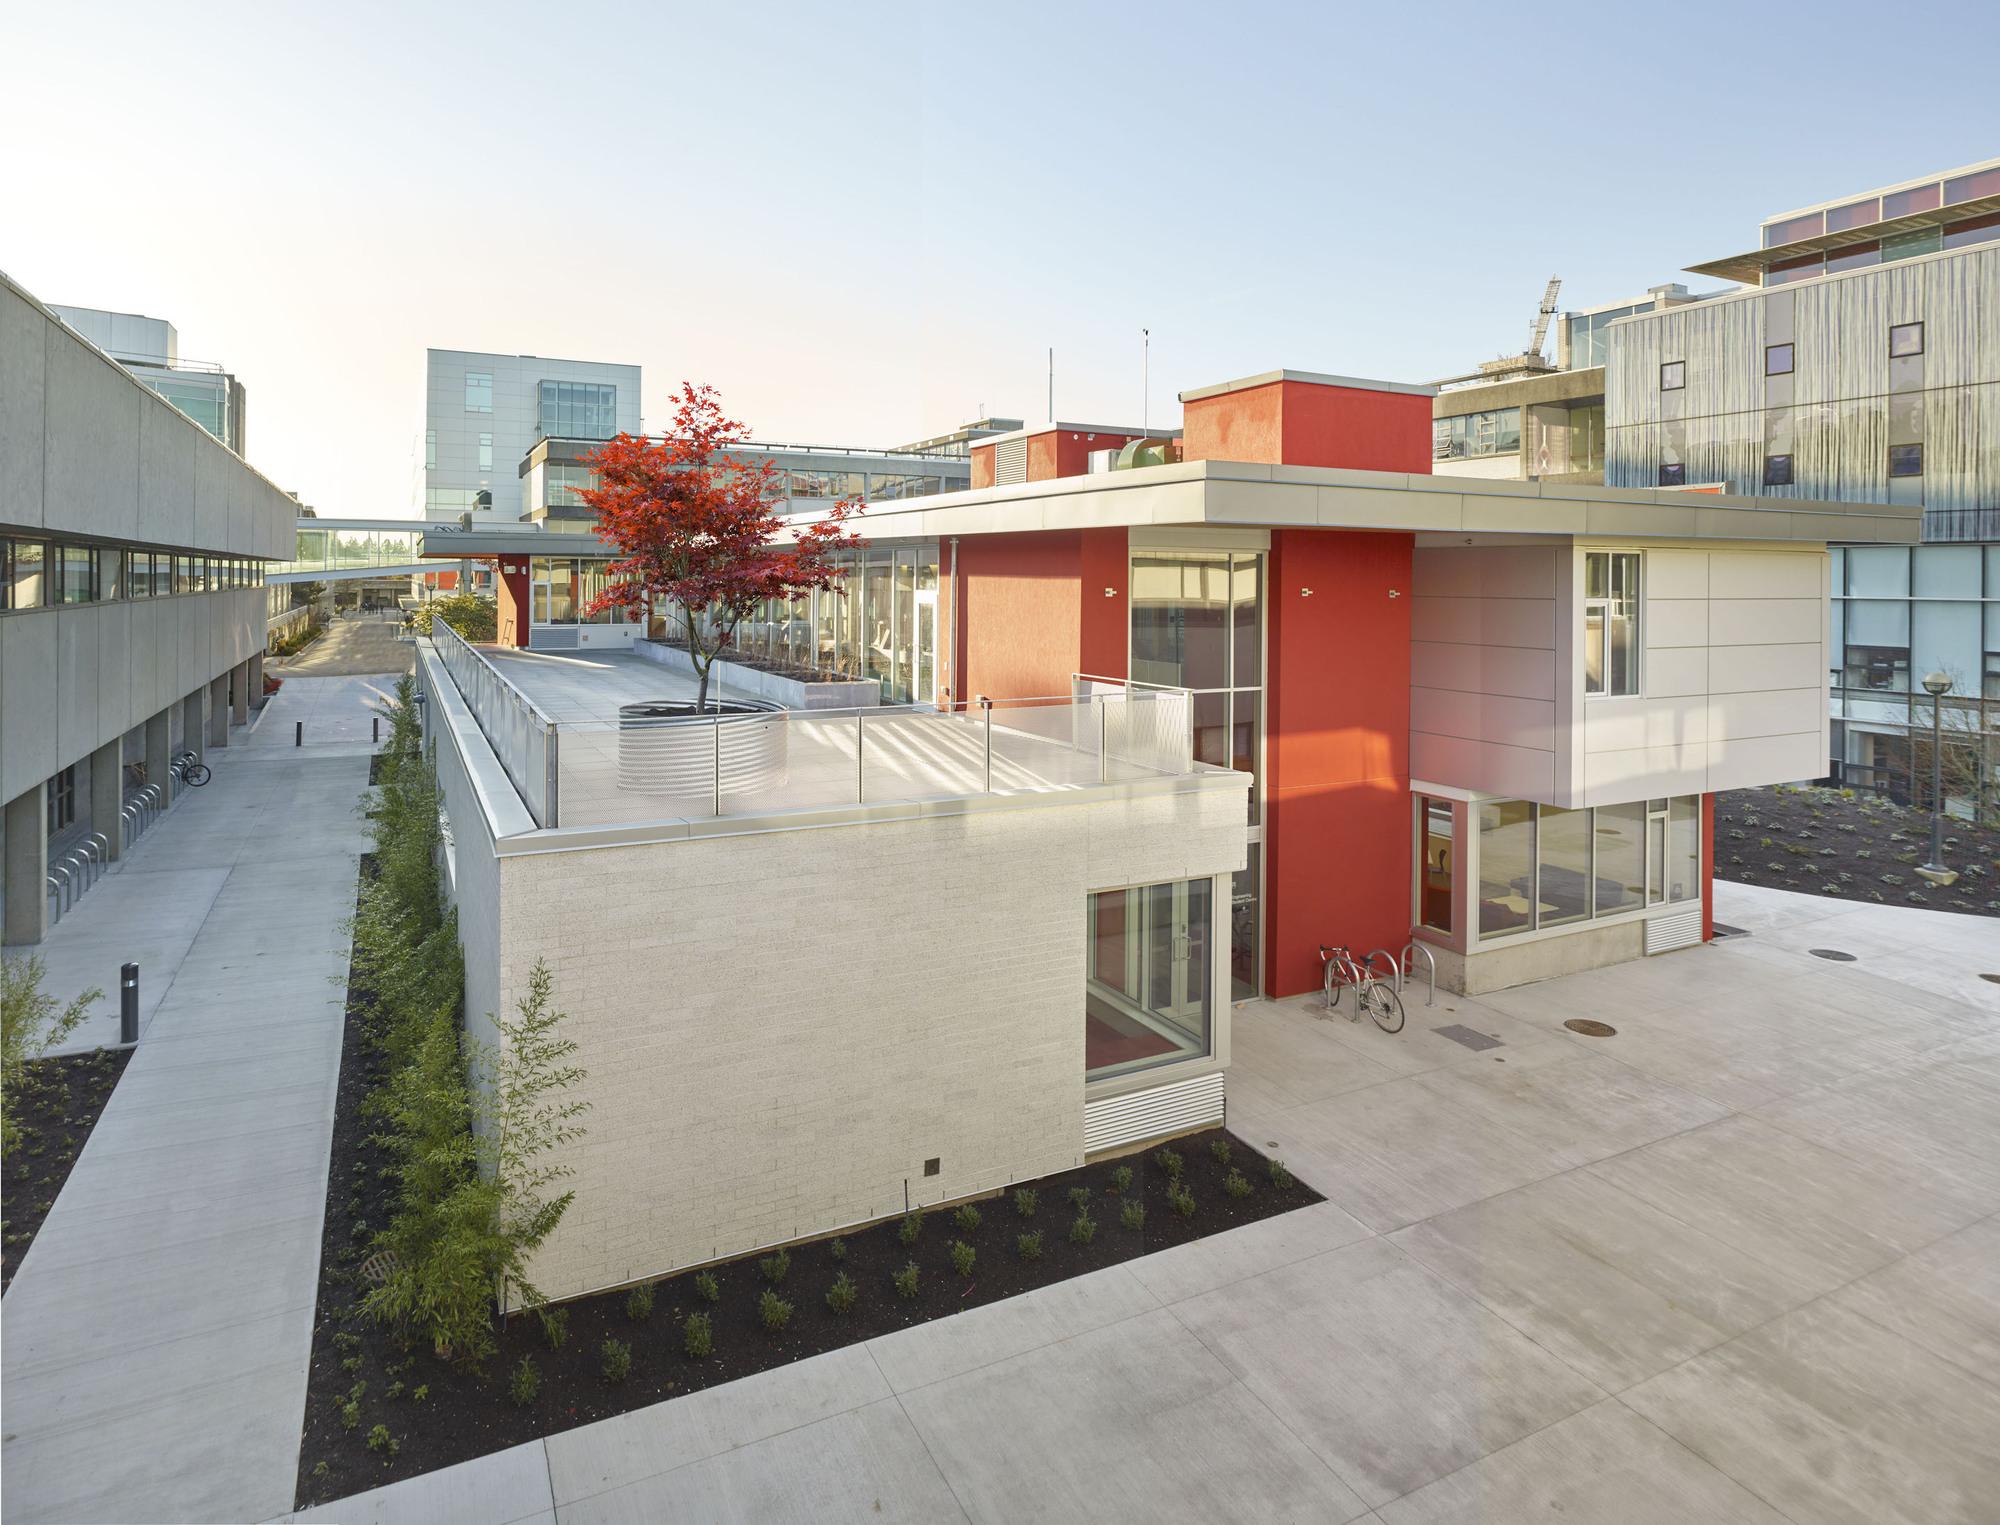 University British Columbia Engineering Student Centre Urban Arts Architecture - 6